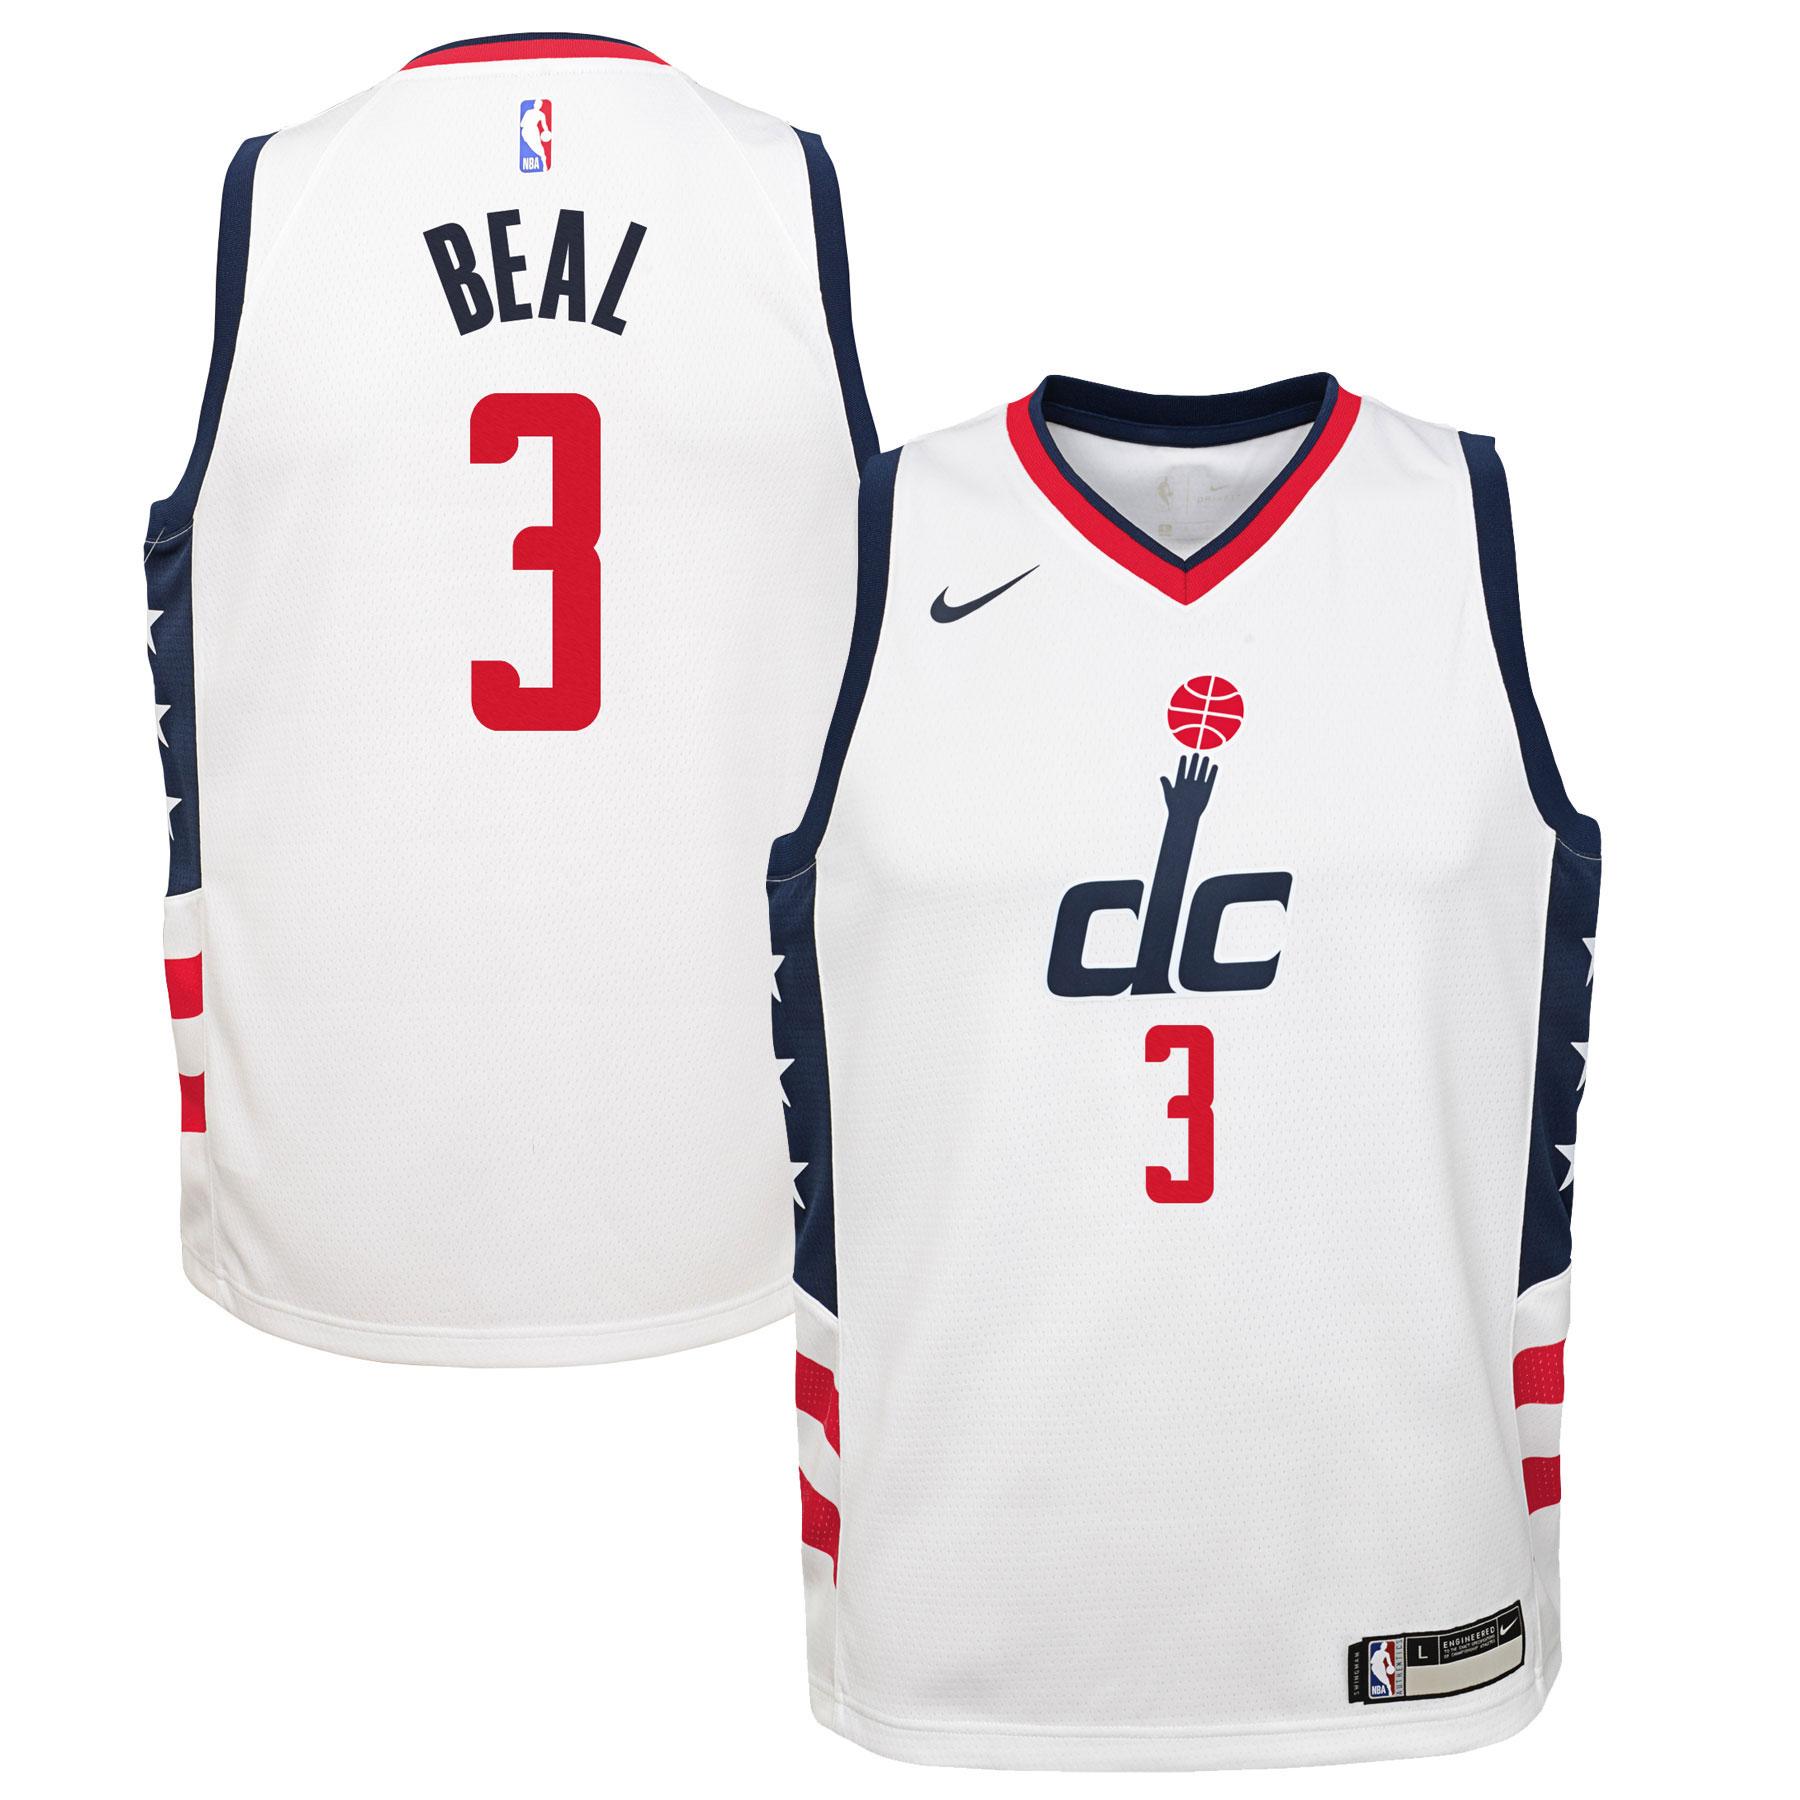 Bradley Beal Washington Wizards Nike Youth Swingman Jersey White - City Edition